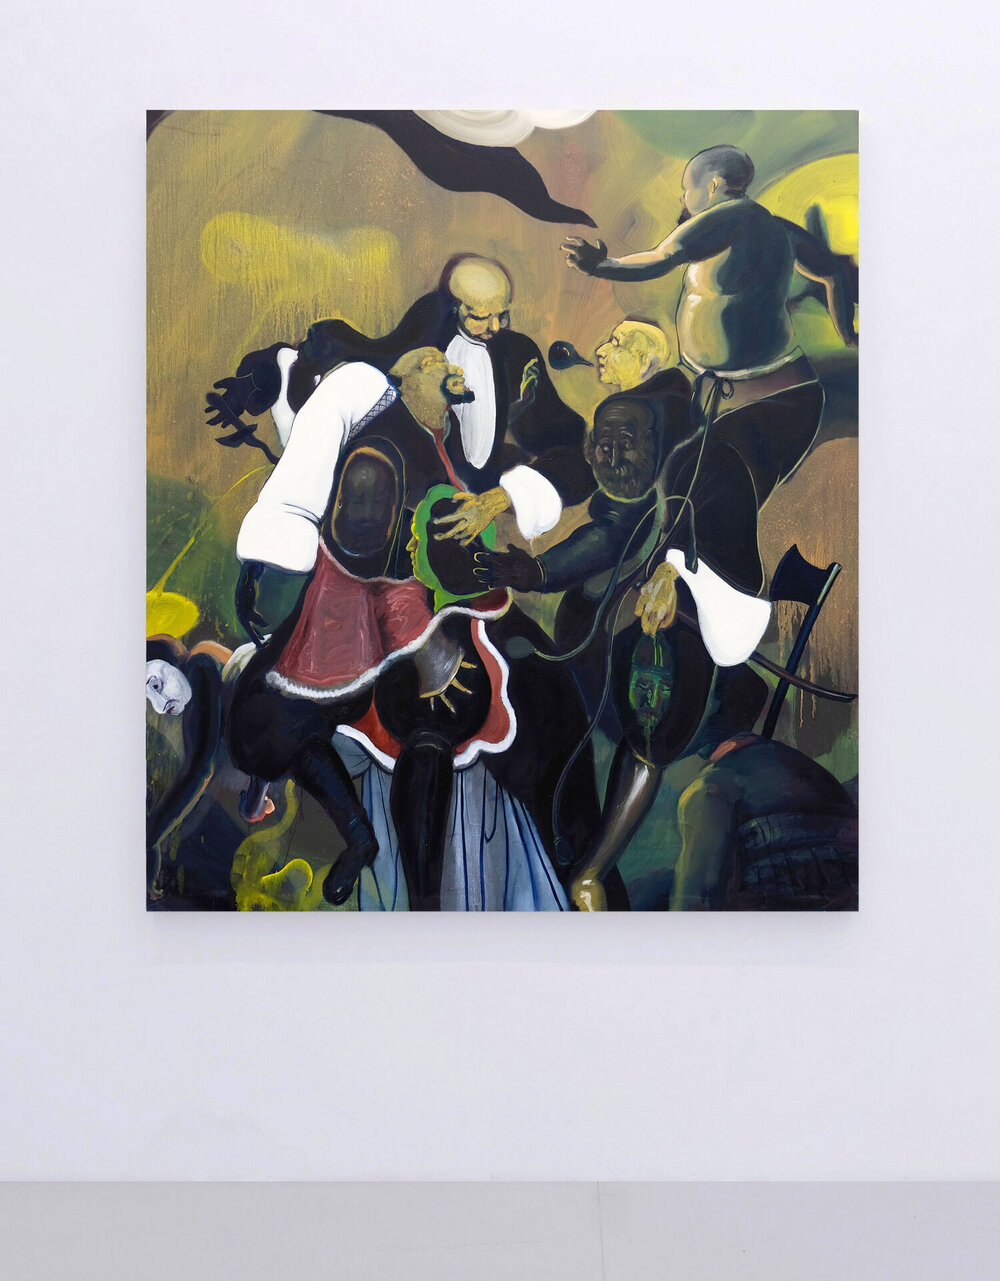 Conquistador & Co  (2017) Oil on canvas, 155 x 175cm